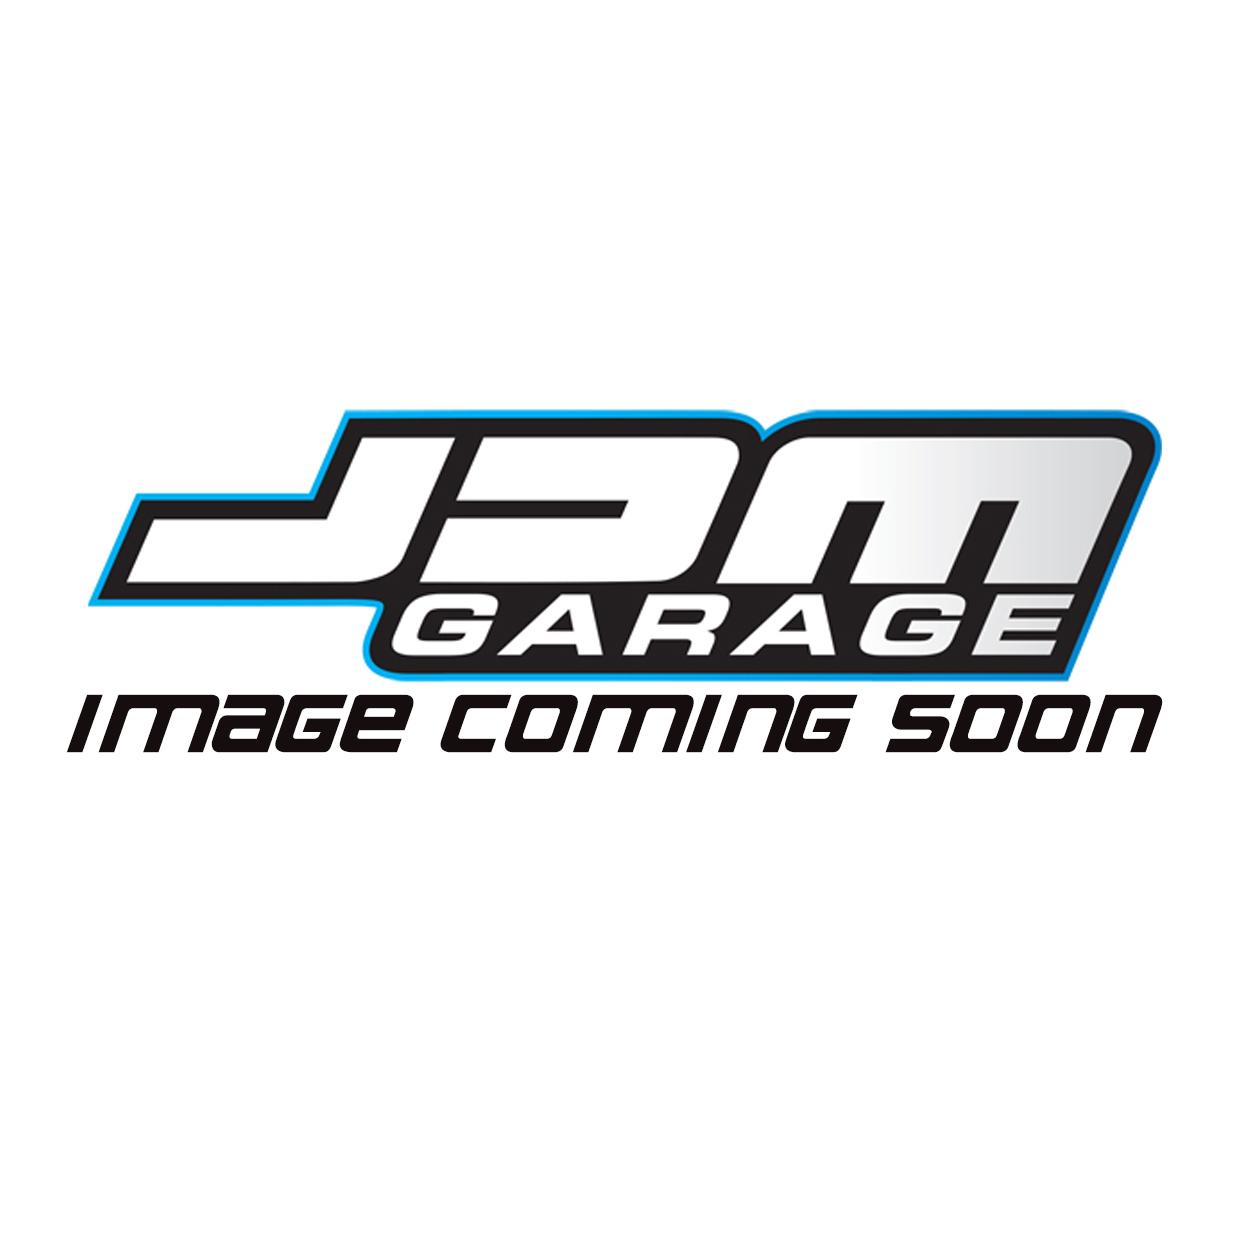 Hardrace Front 4-5 Lug 114.3 Conversion Kit + Bearing For Nissan Silvia S13 180SX